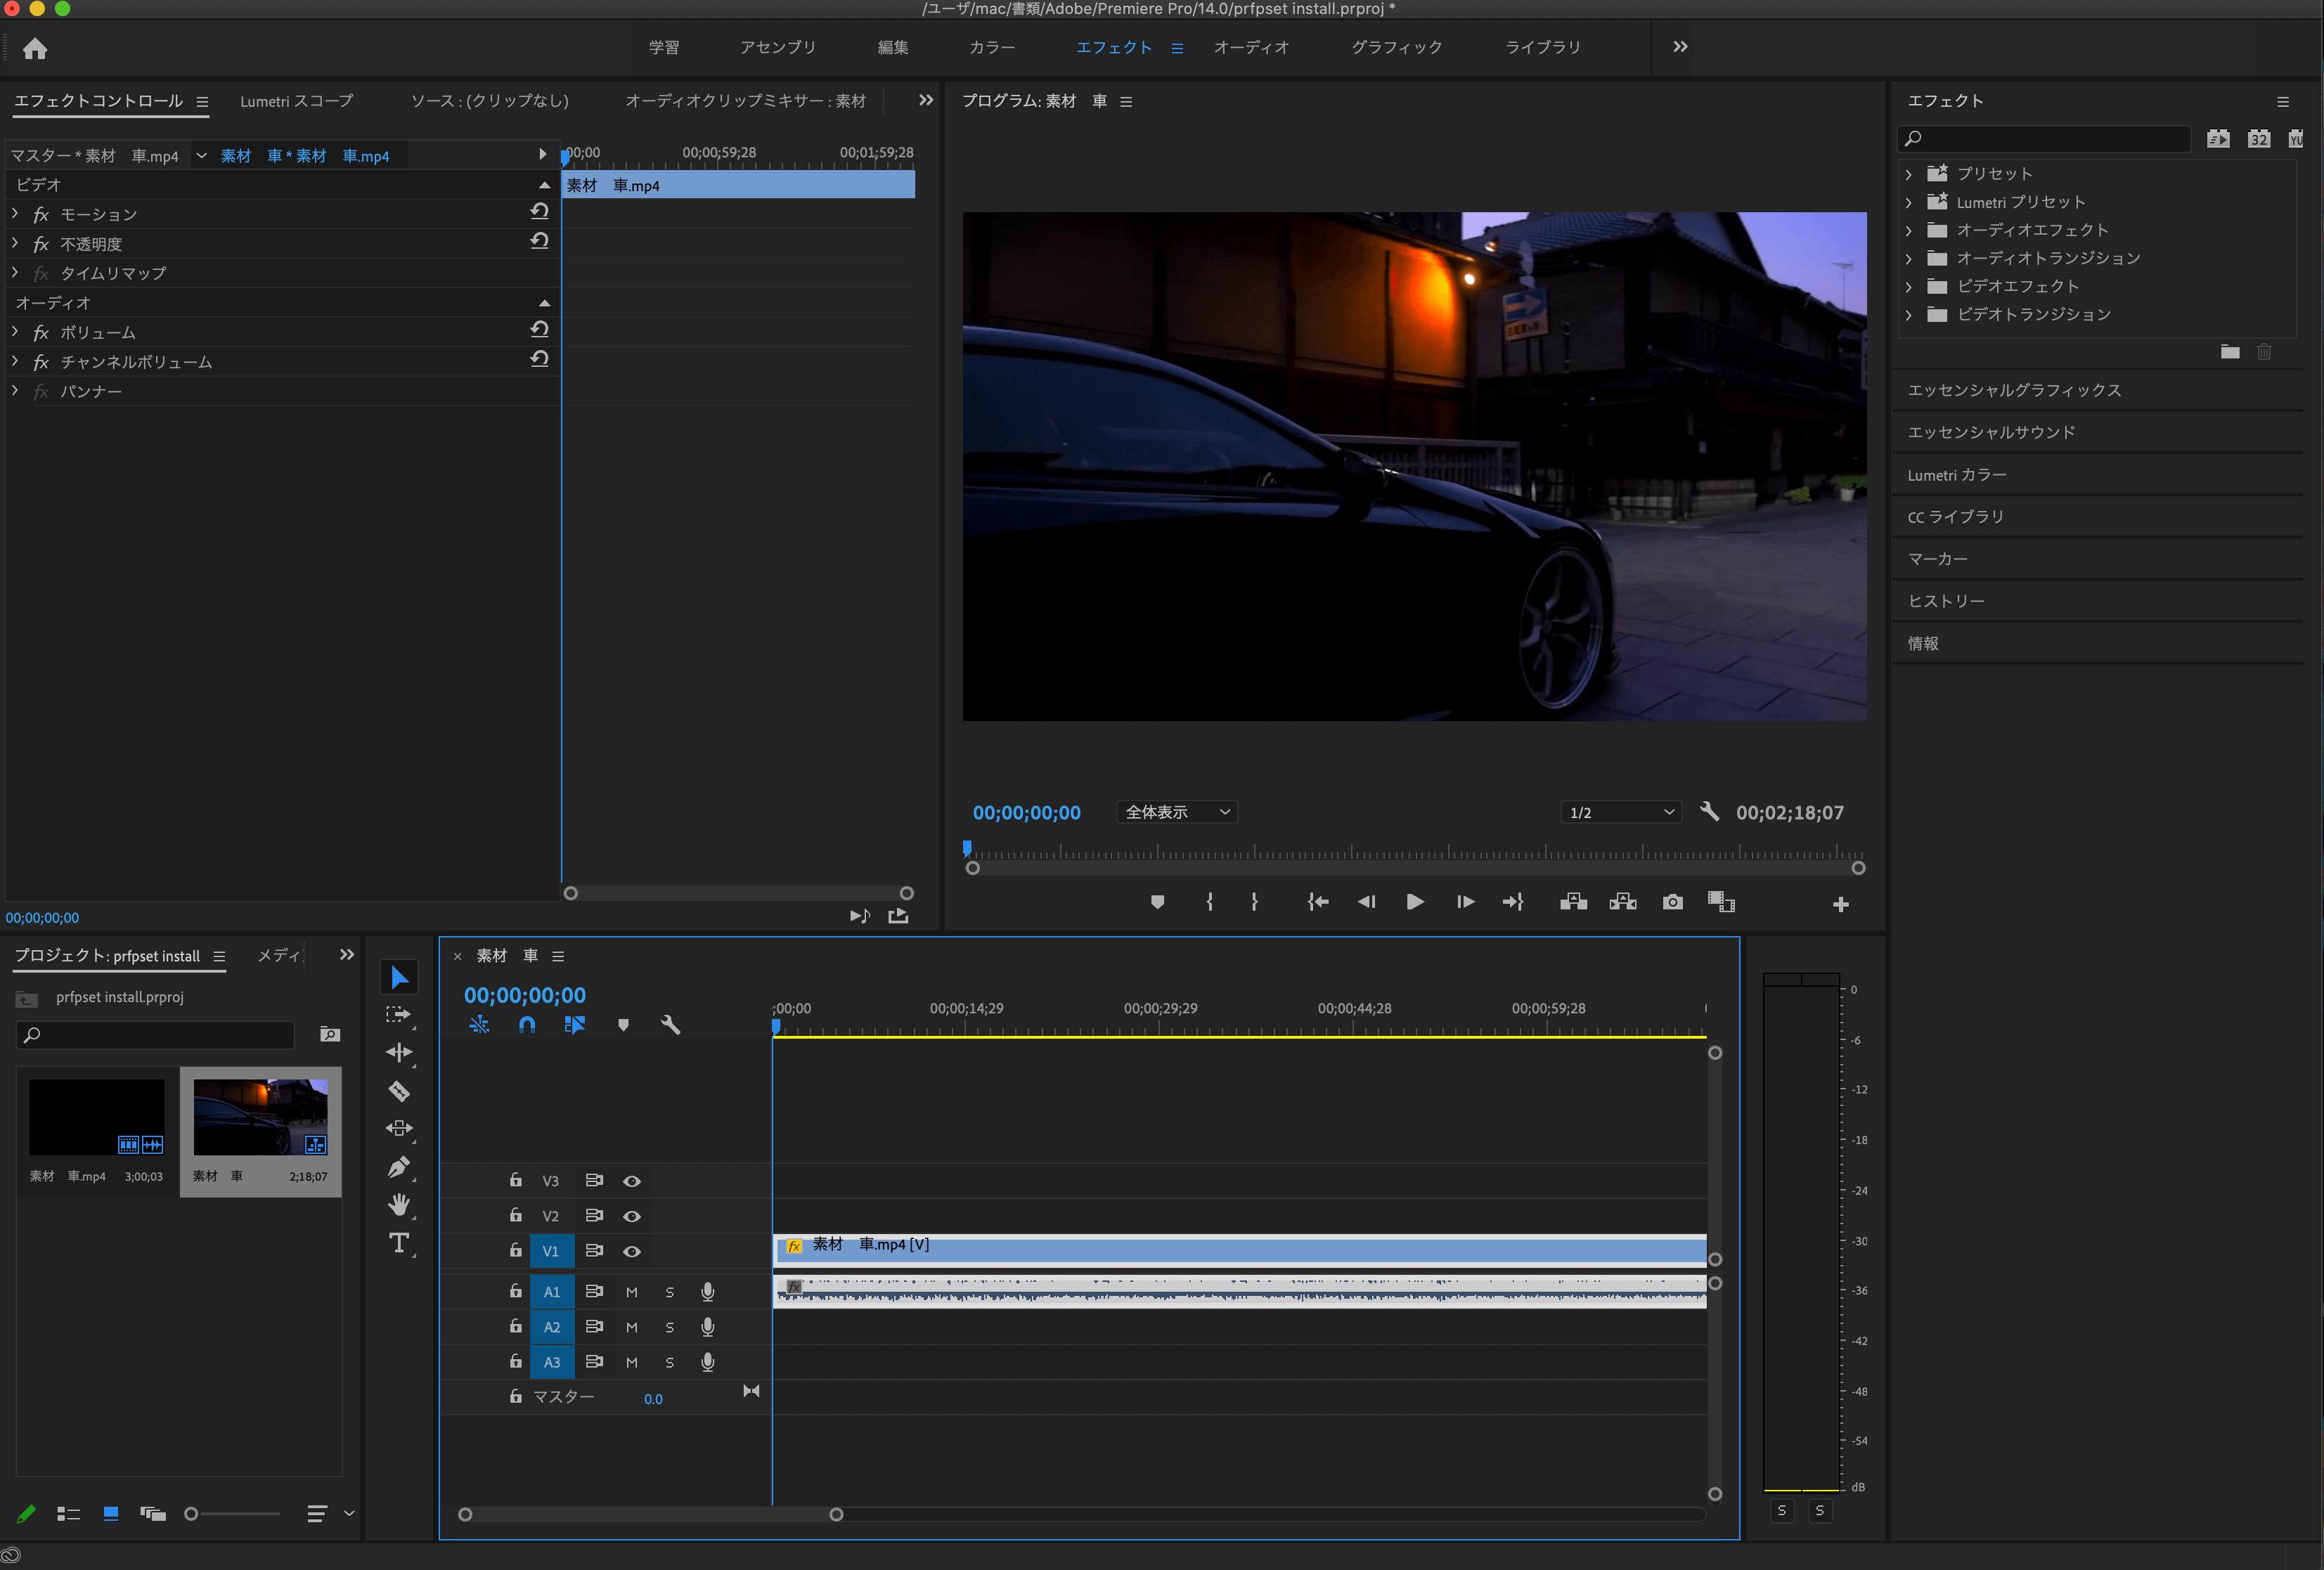 Adobe Premiere Proを起動し素材を読み込む